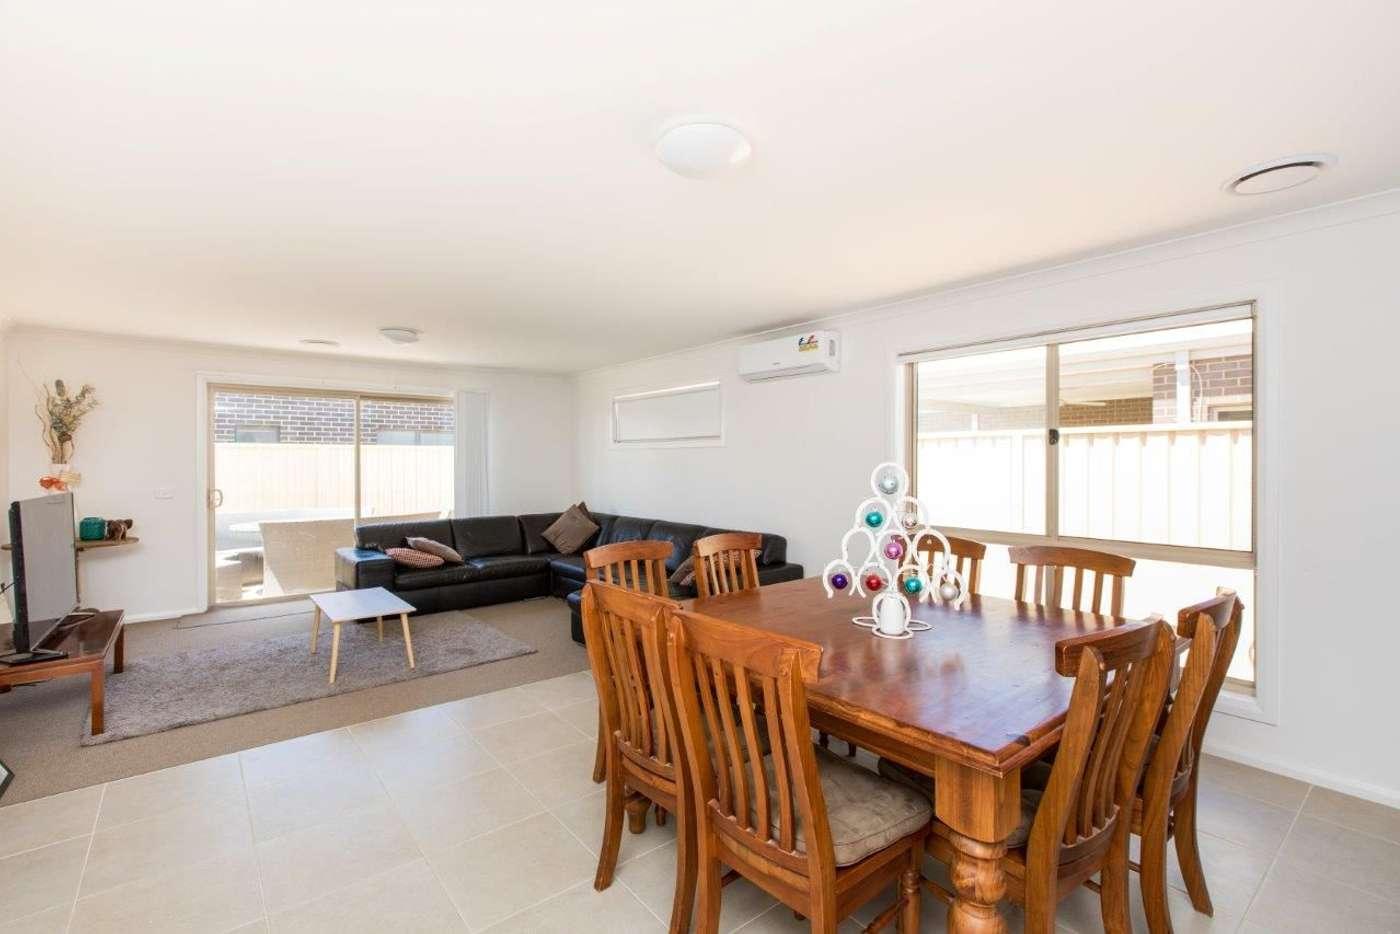 Sixth view of Homely house listing, 17 Midtown Drive, Mildura VIC 3500